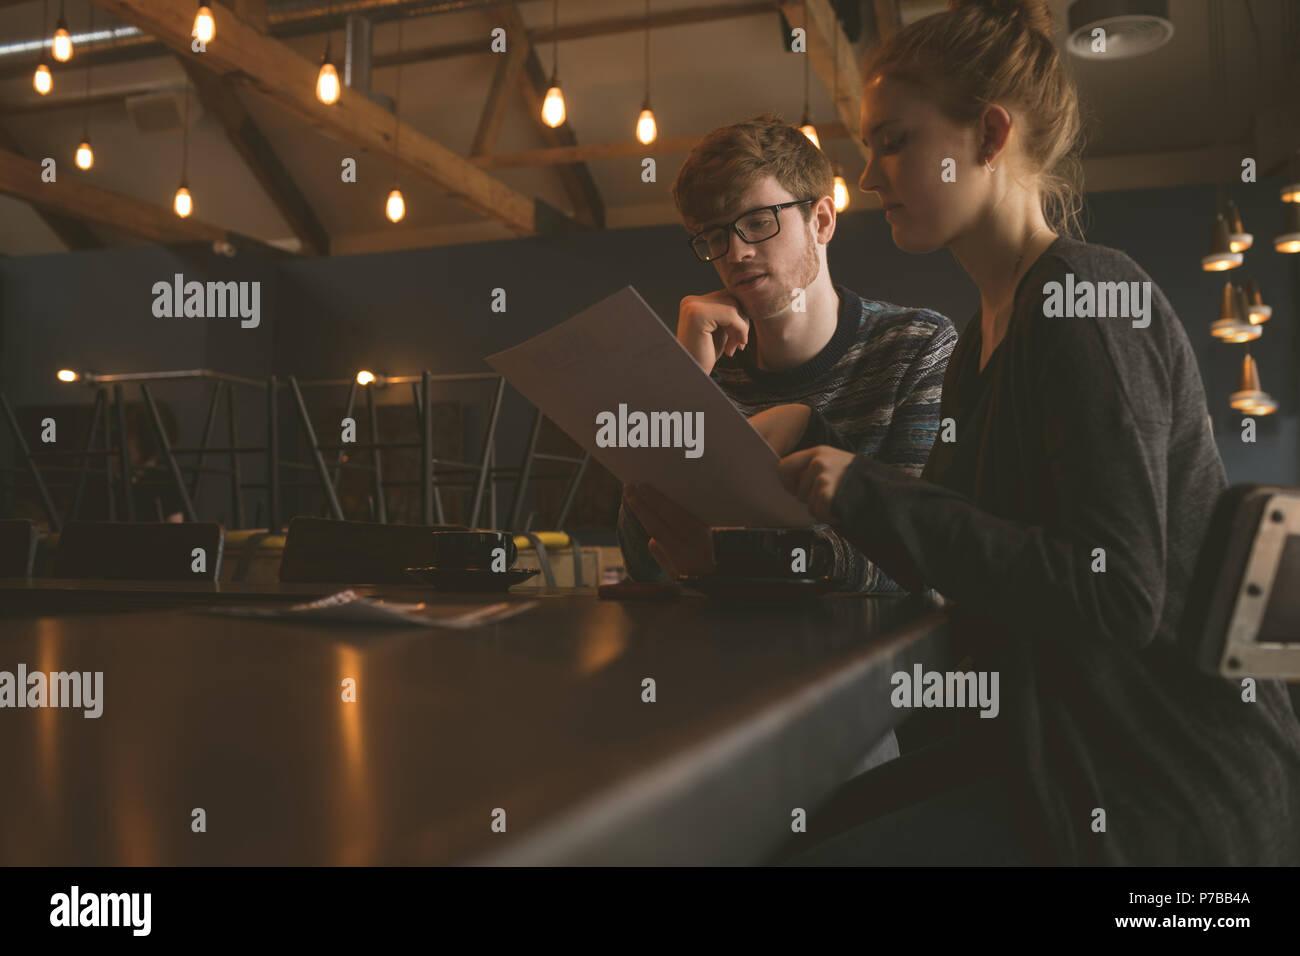 Paar Prüfen der Speisekarte im Restaurant Stockbild